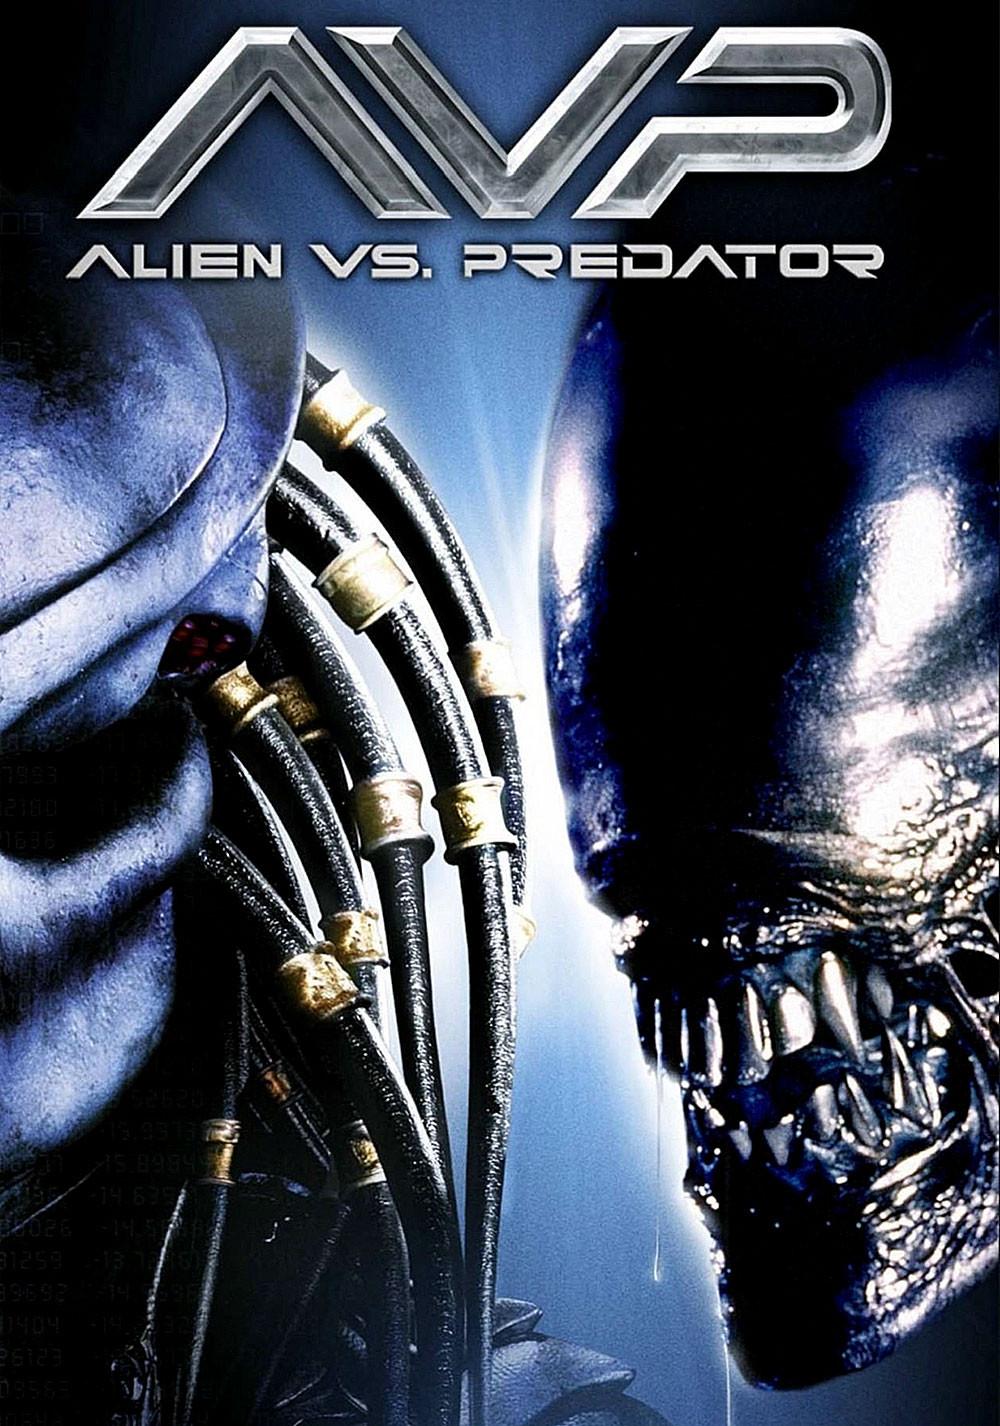 Alien Futanari alien vs predator: futa addition — chyoa